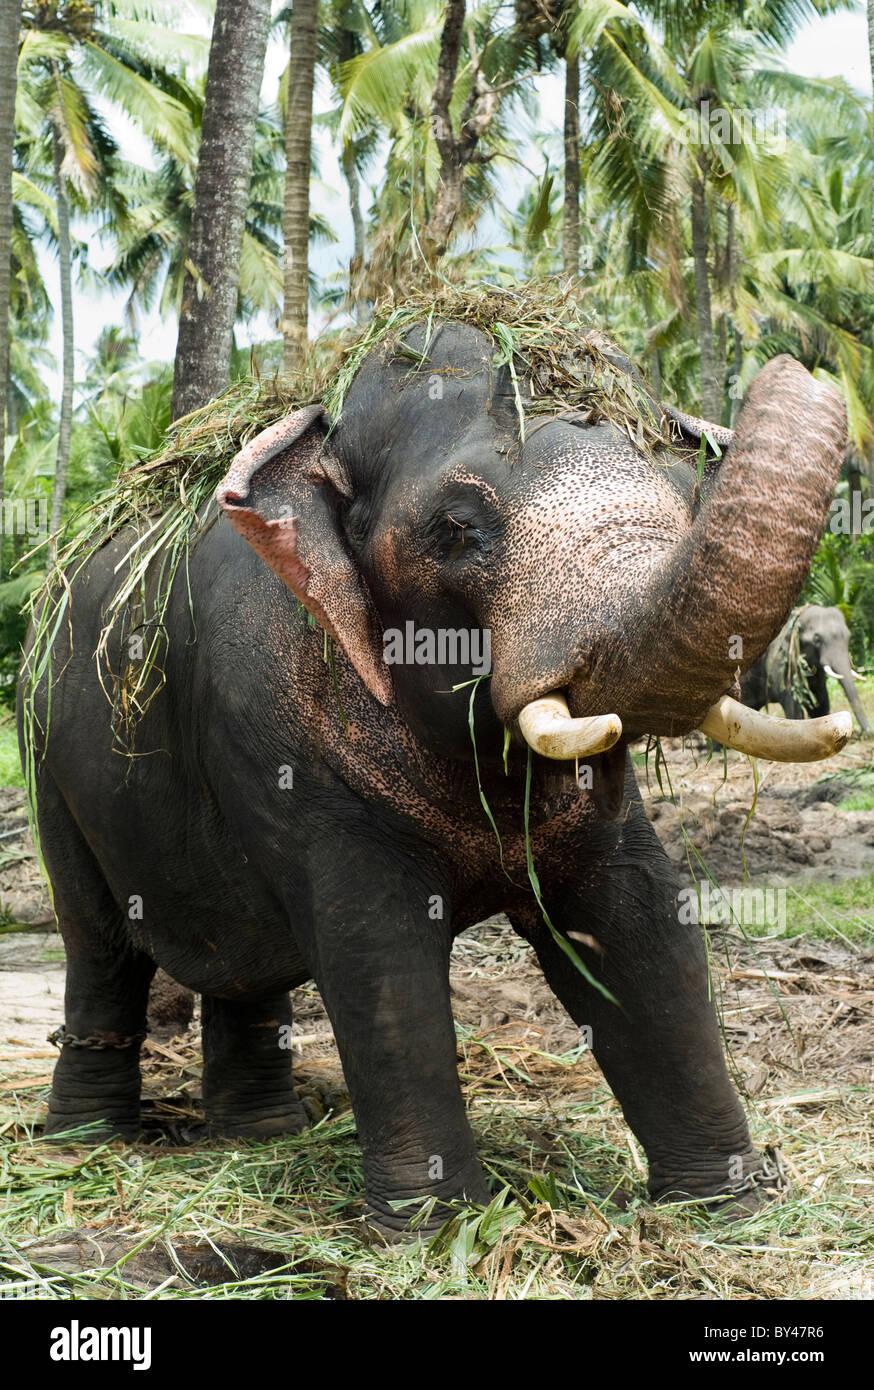 Elephant Sanctuary Stock Photos & Elephant Sanctuary Stock ...